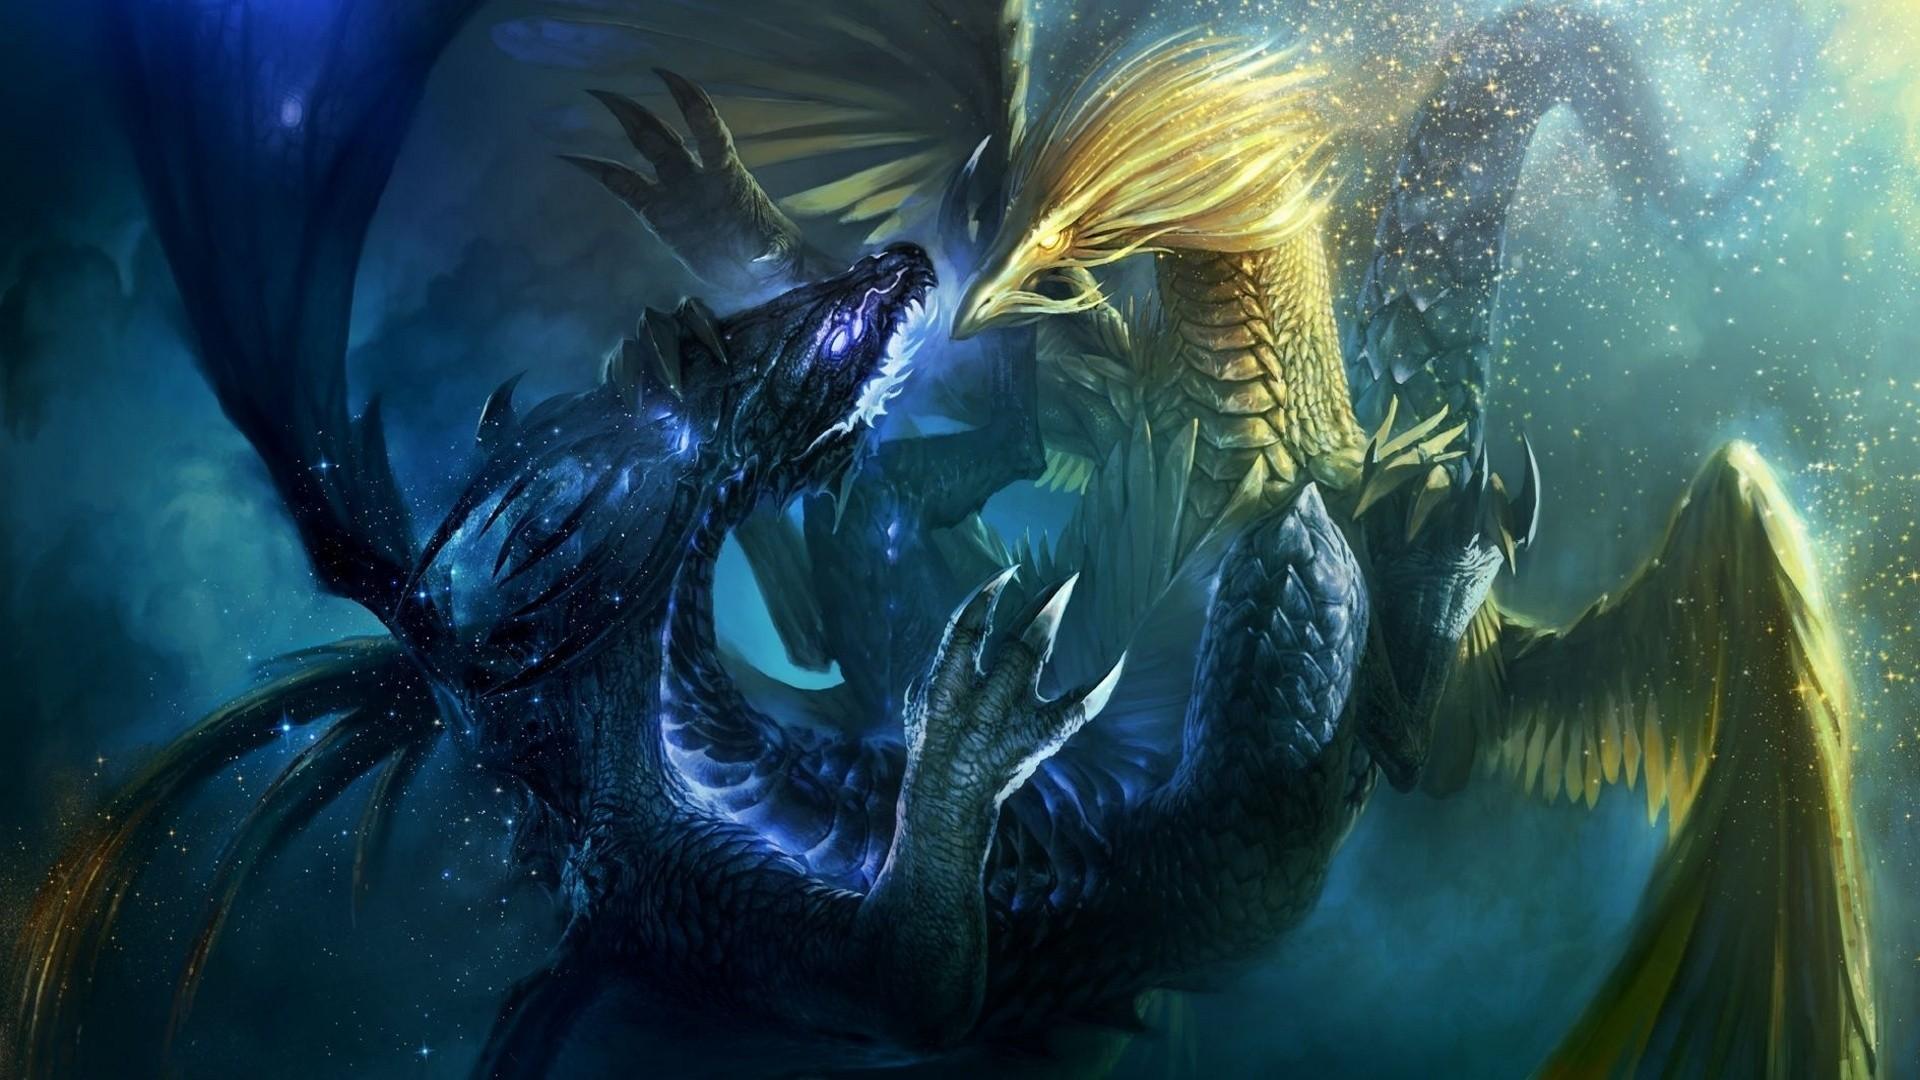 Artwork Battles Dragons Fantasy Art Heroes Of Might And Magic VI Video Games